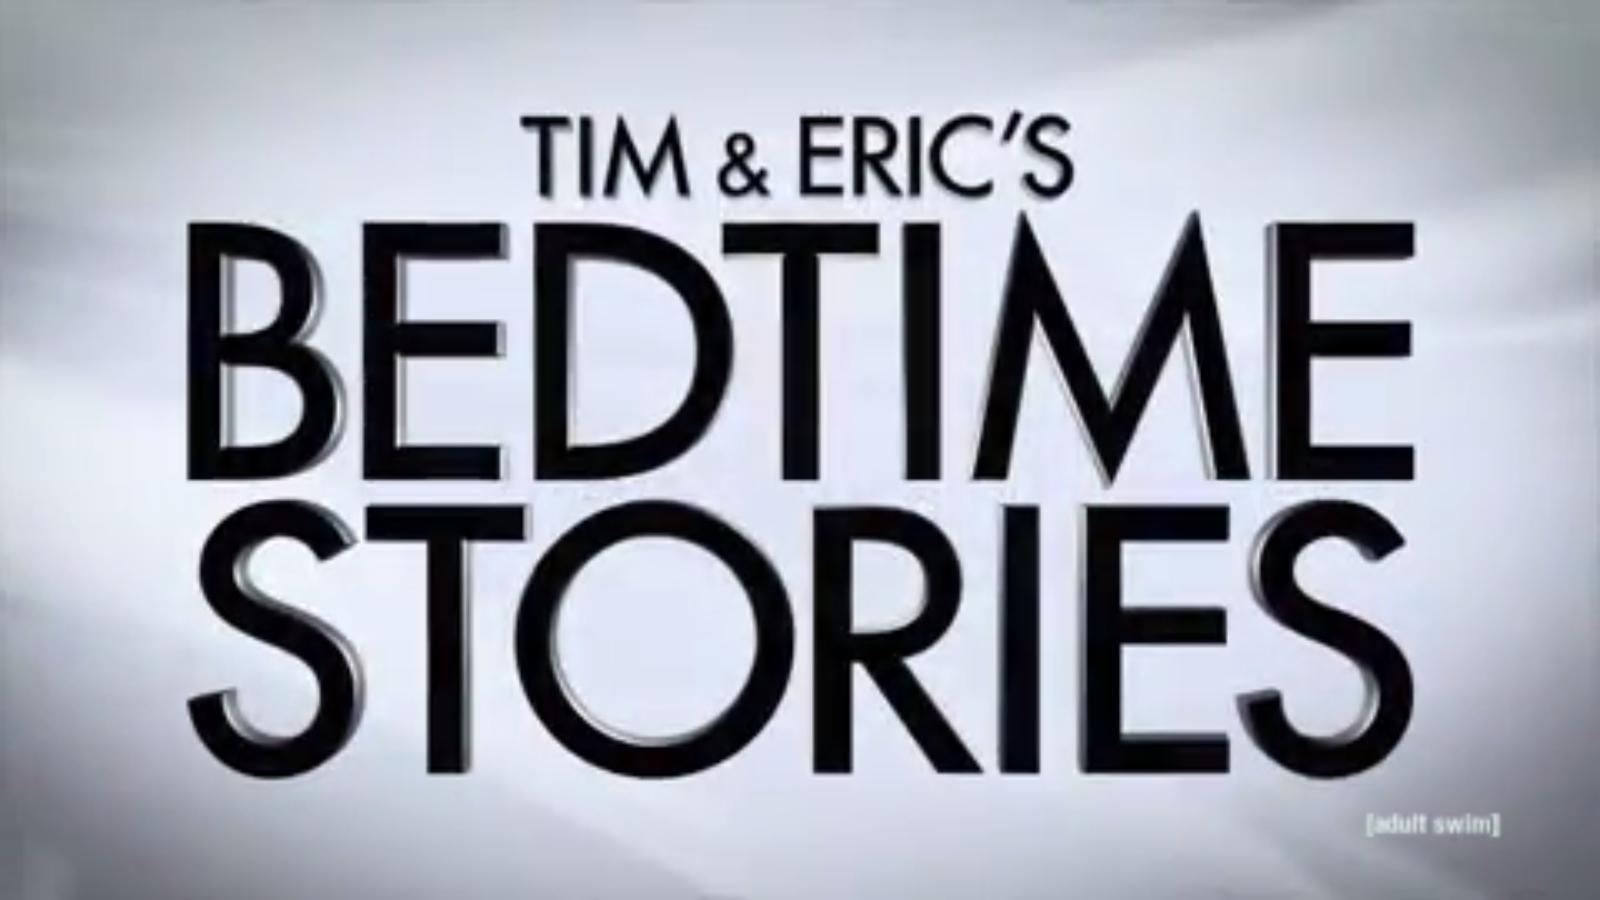 image - bedtime stories | [adult swim] wiki | fandom powered